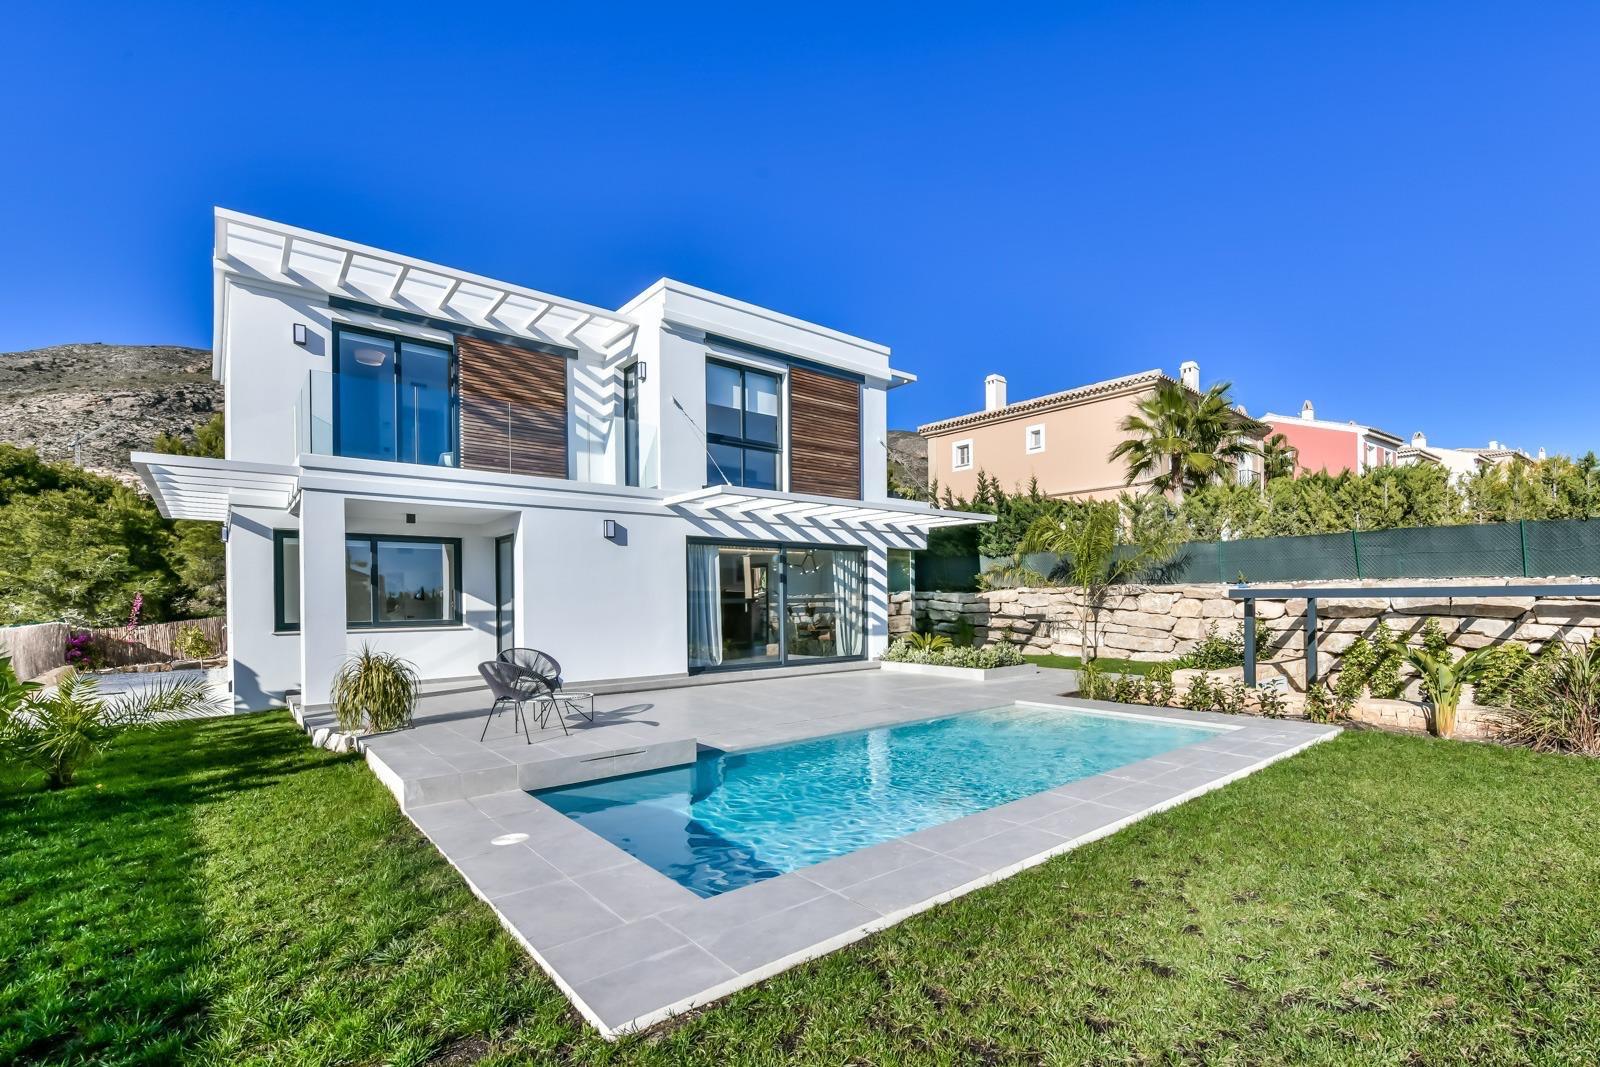 For Sale Luxury Villa In Finestrat Finestrat Sierra Cortina With Swimming Pool